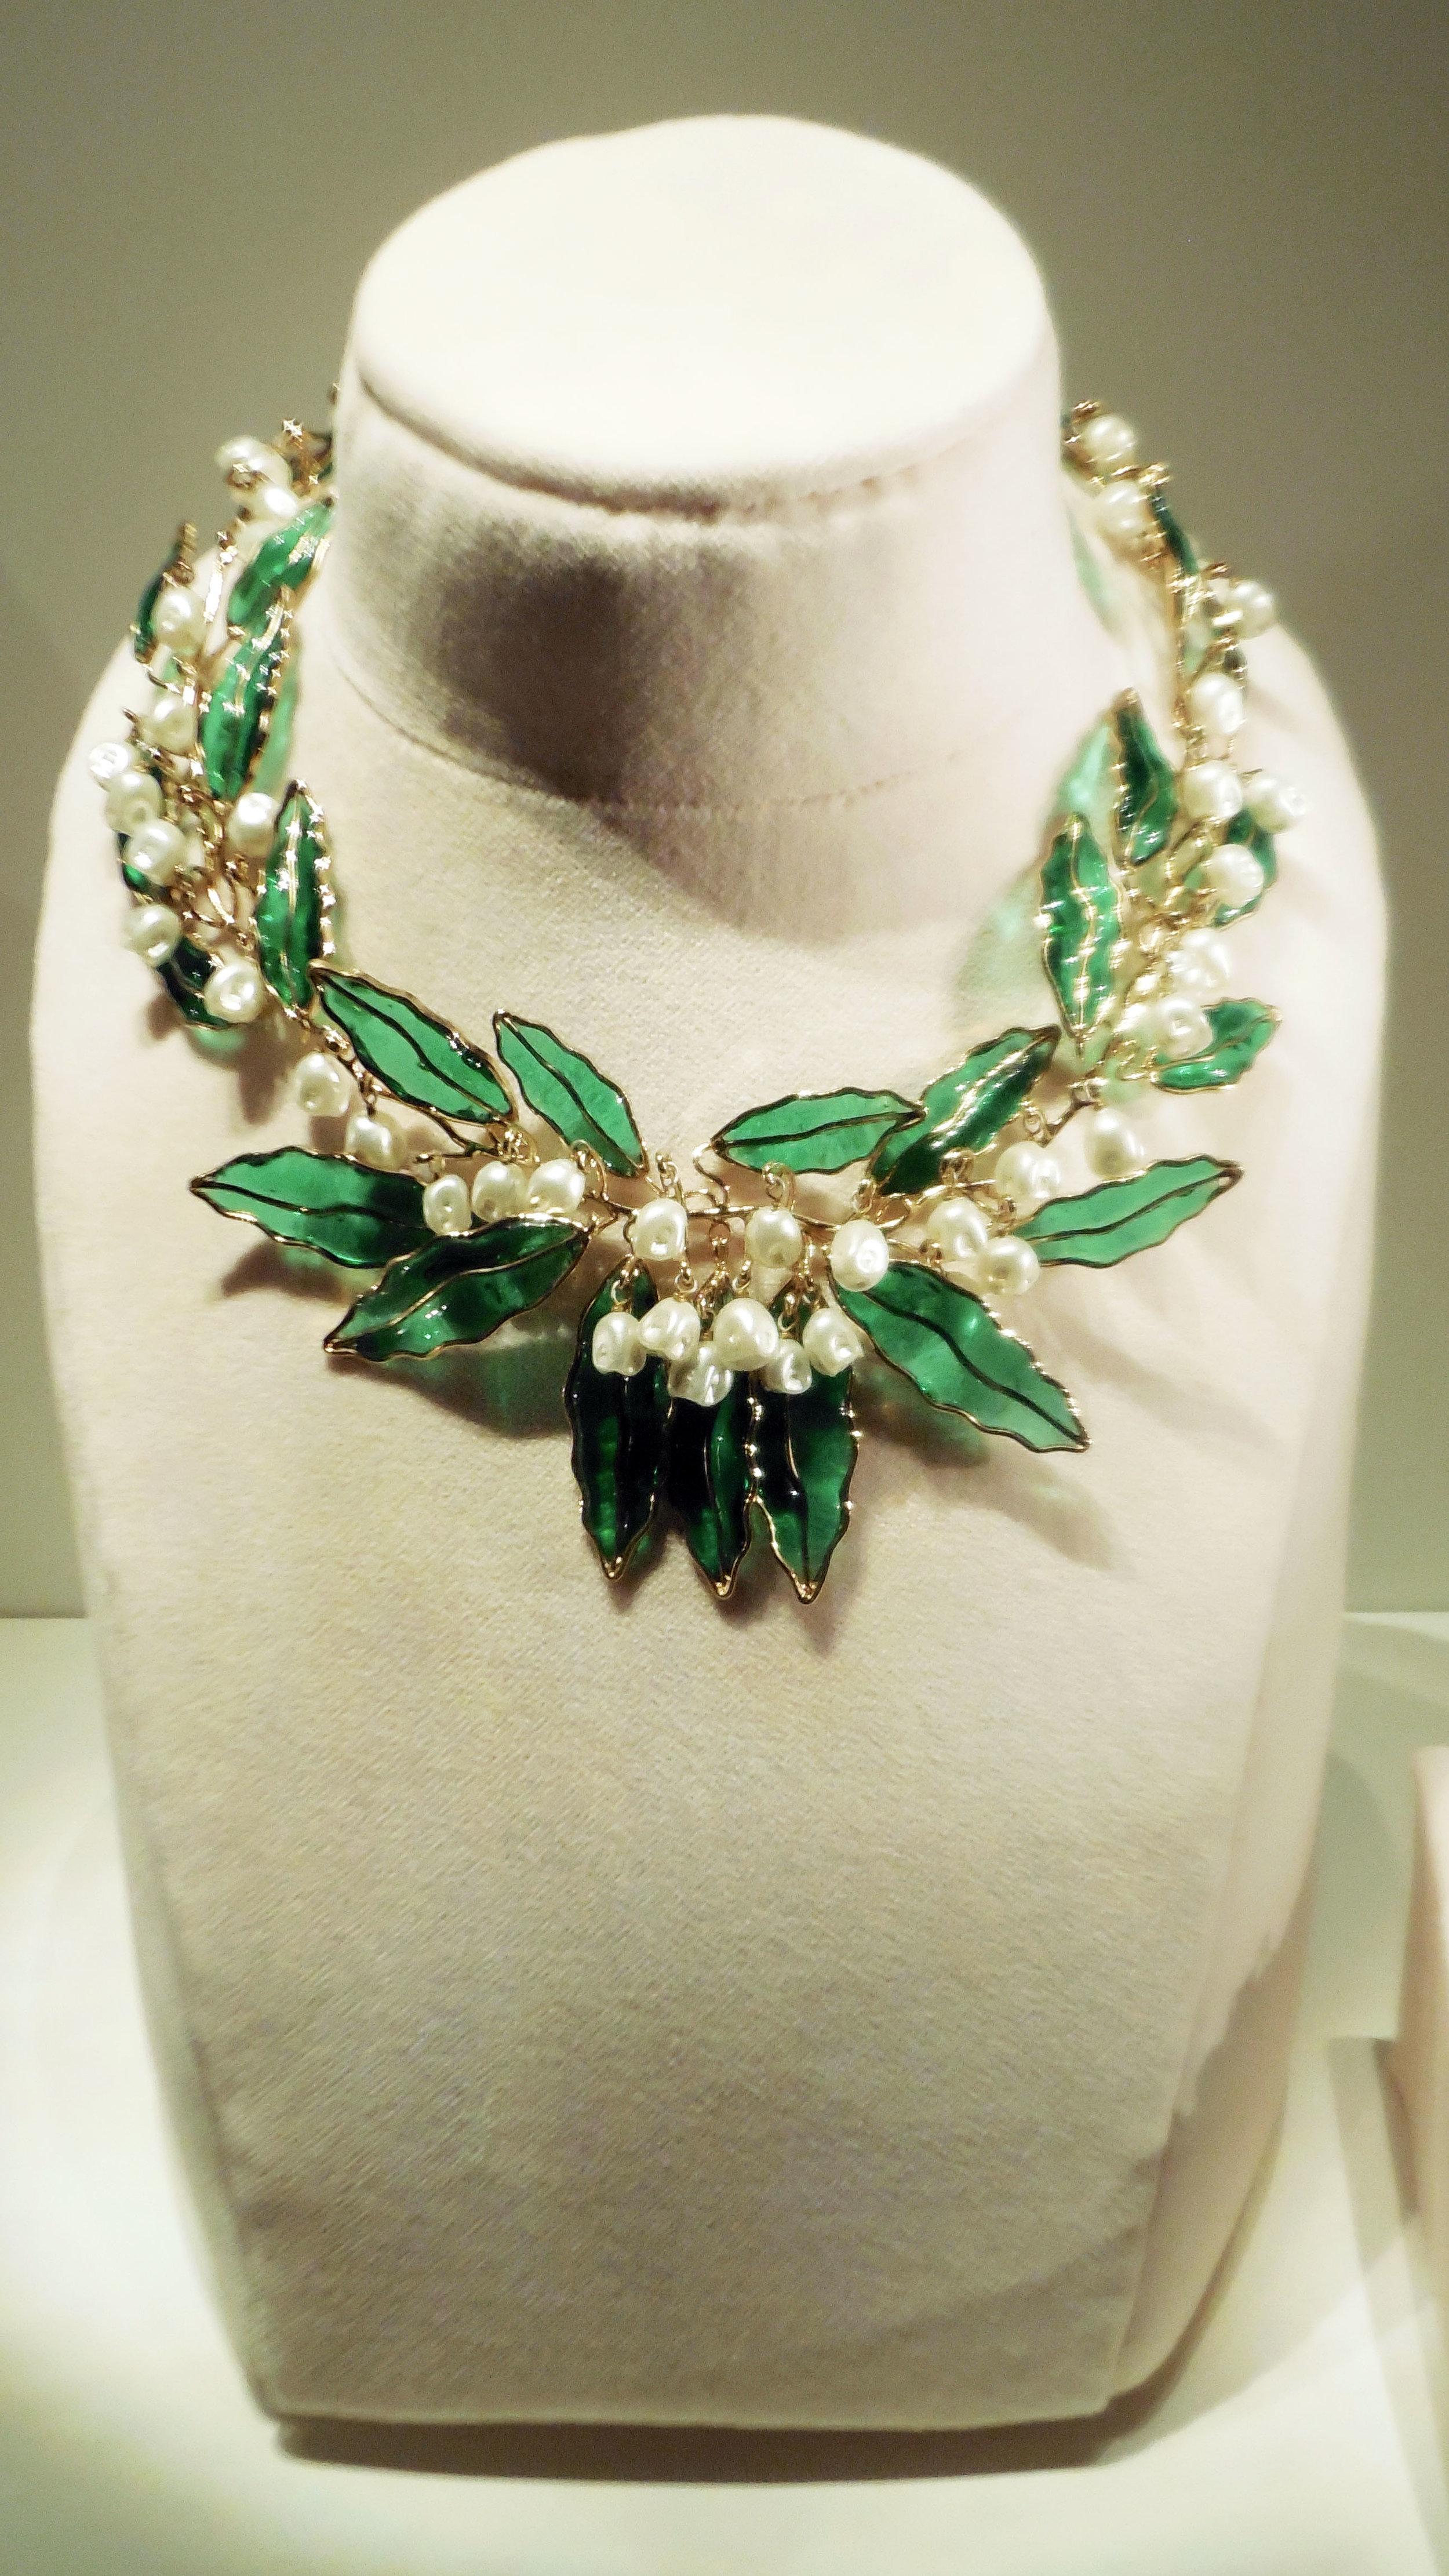 Dior Green Leafy Necklace.jpg